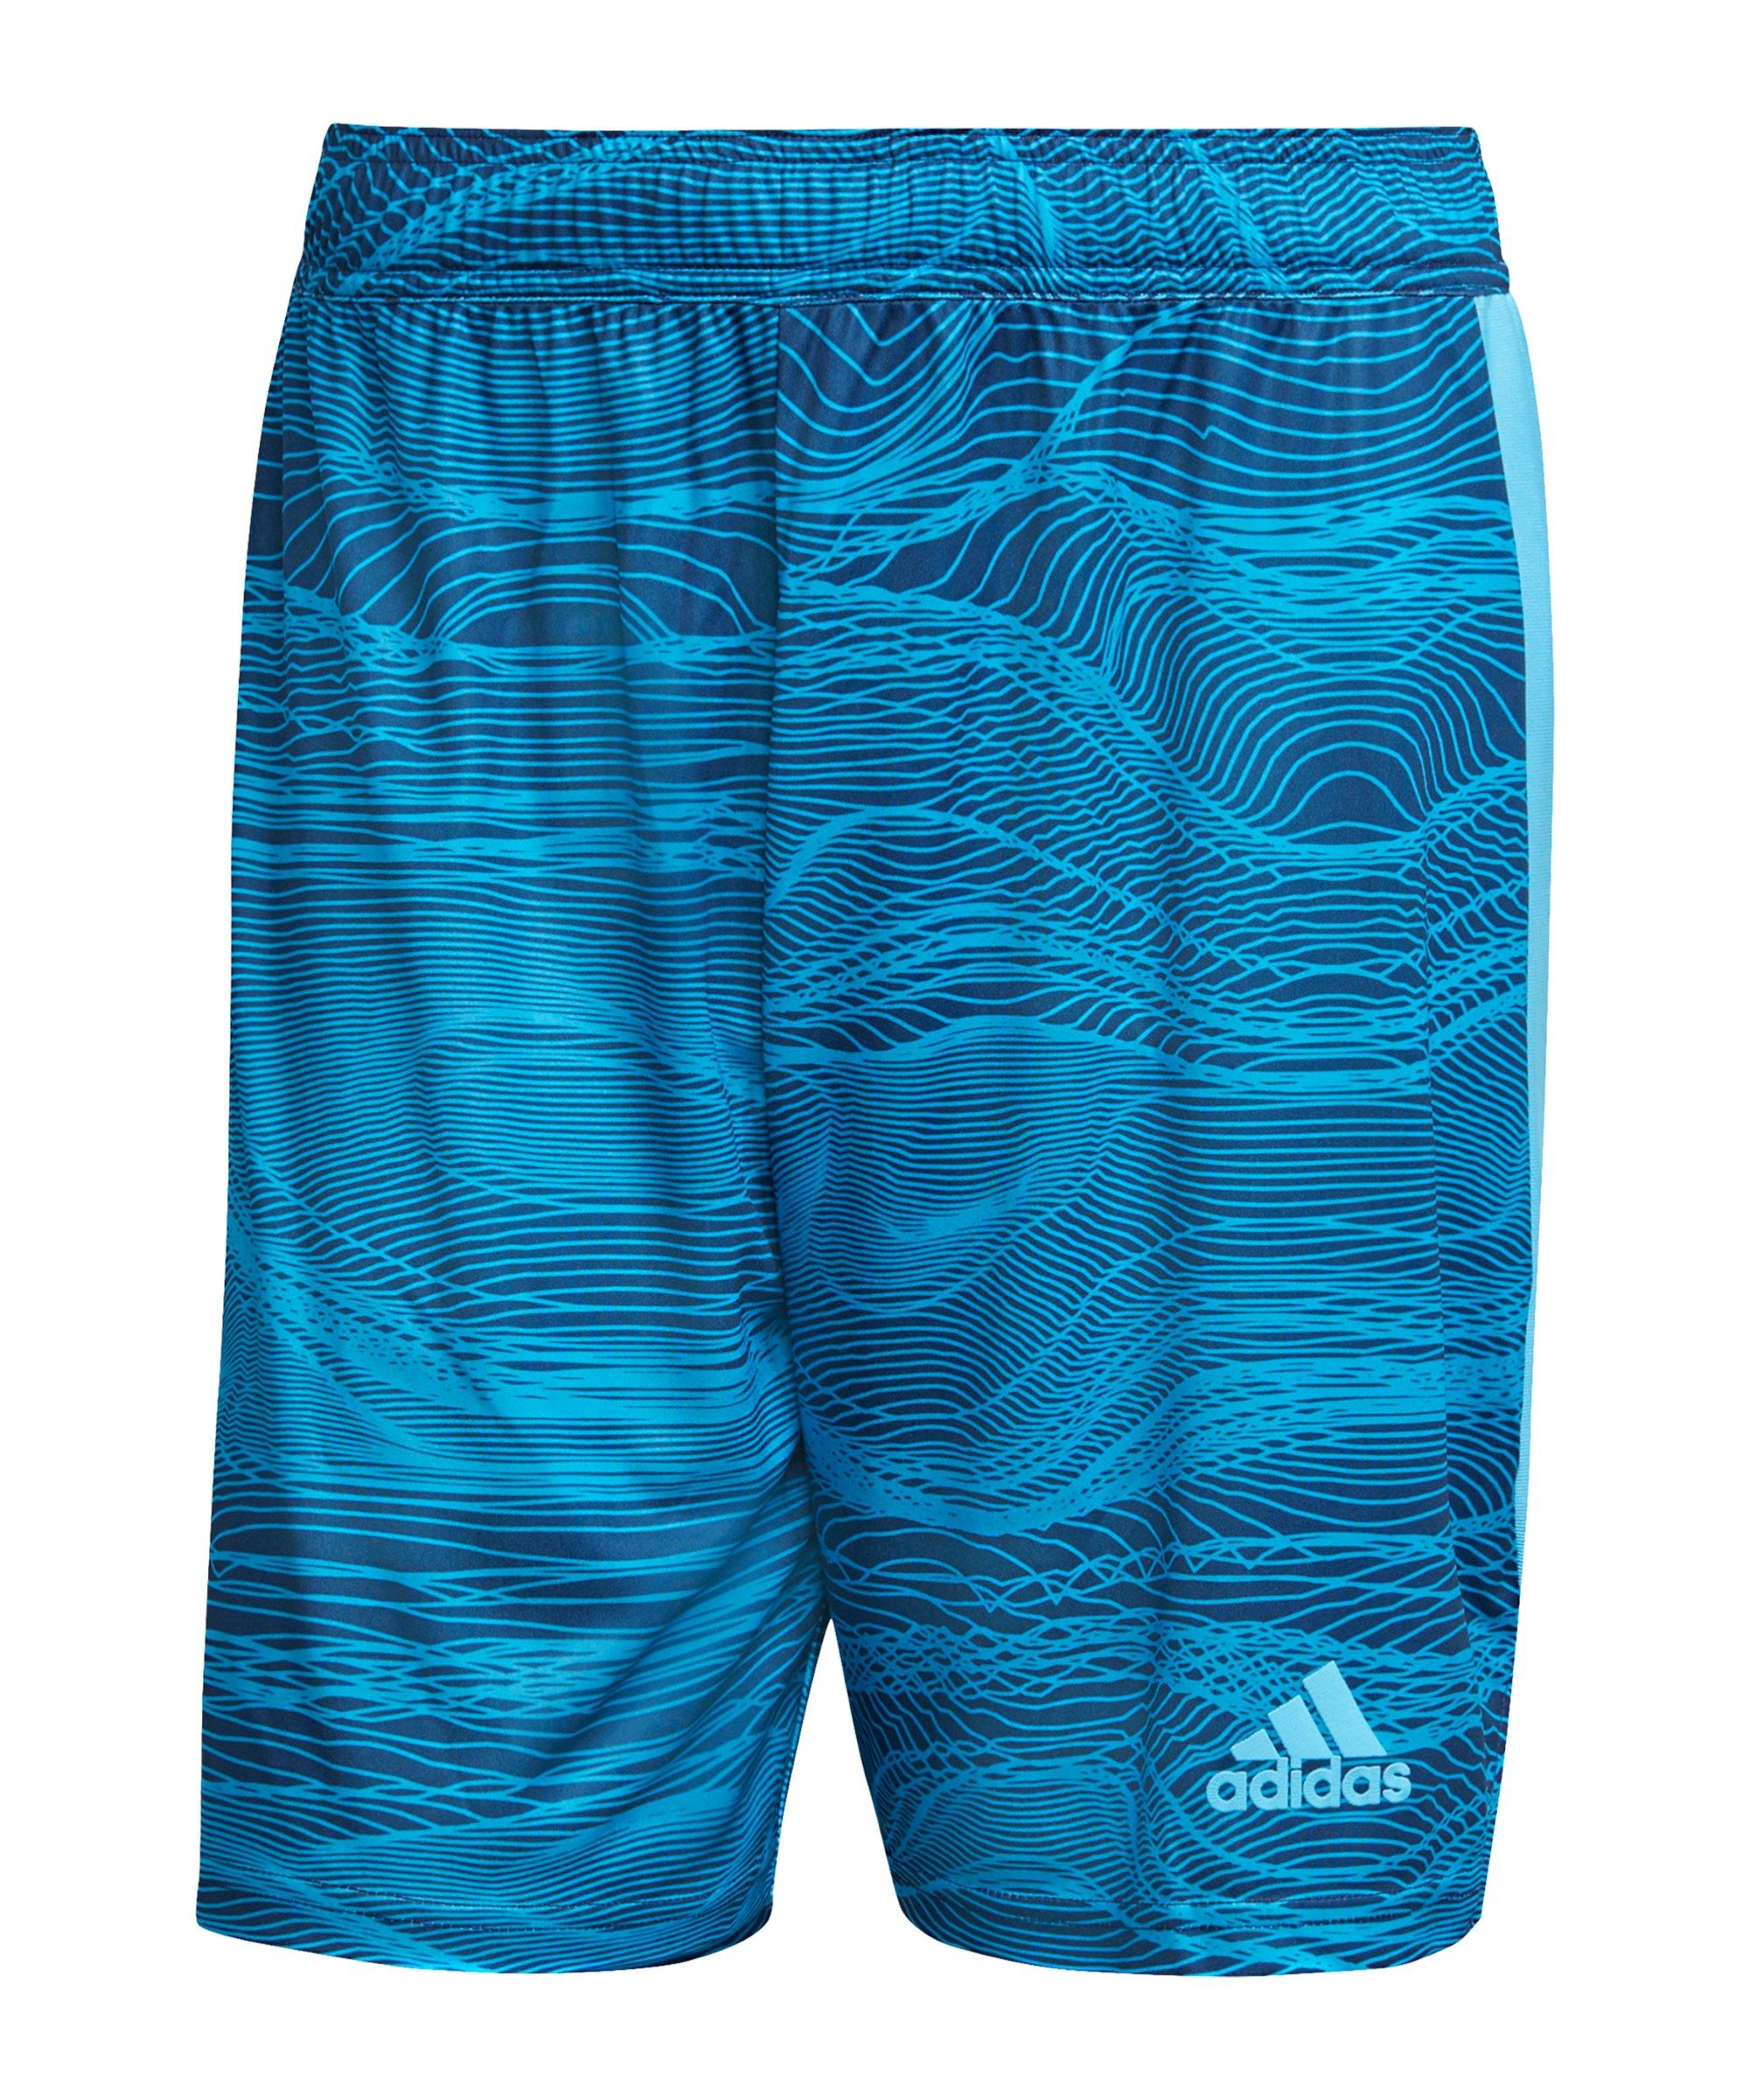 adidas Condivo 21 Torwartshort Blau - blau